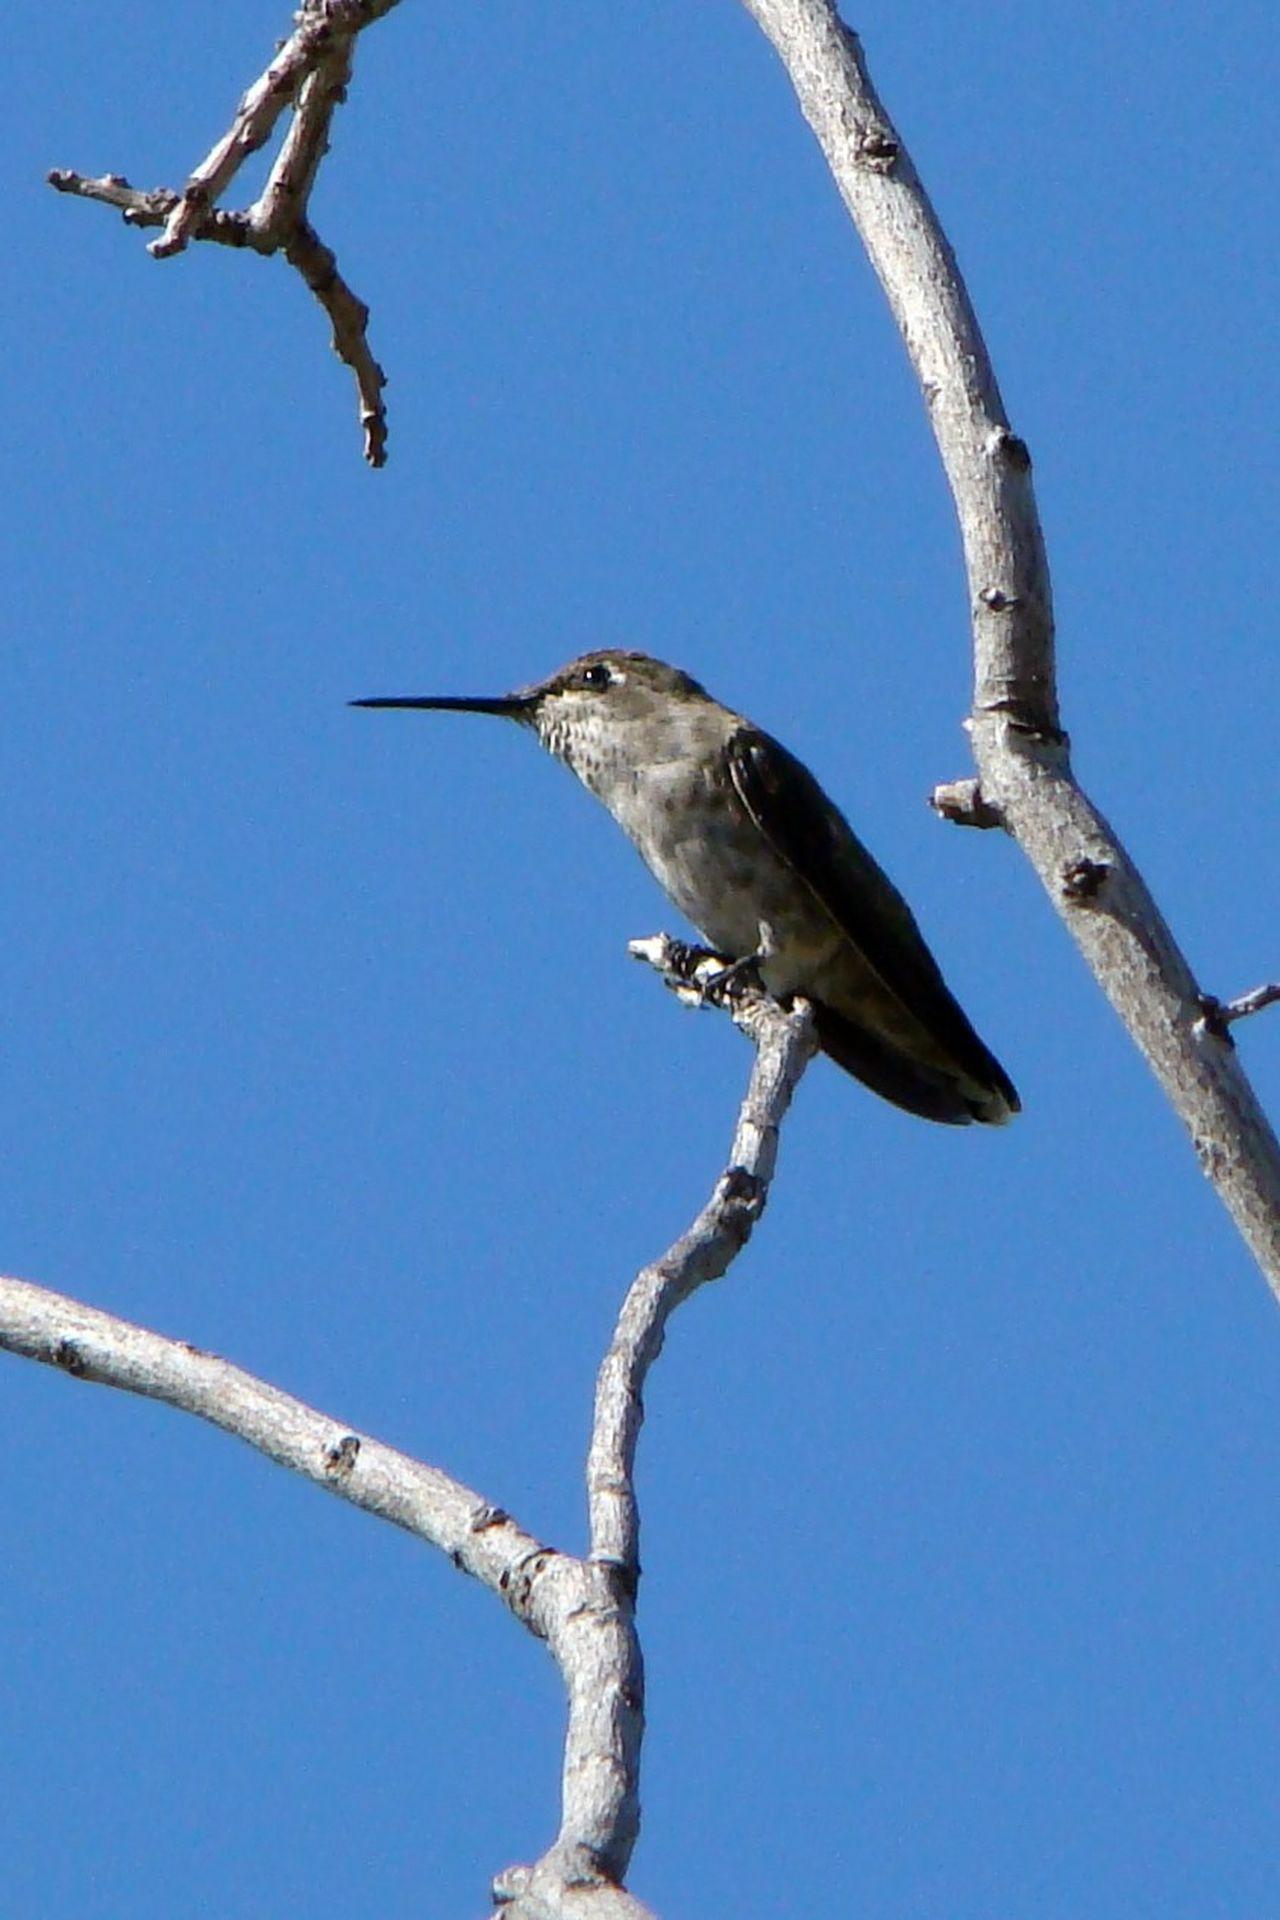 The Purist (no Edit, No Filter) Hummingbird Birdwatching